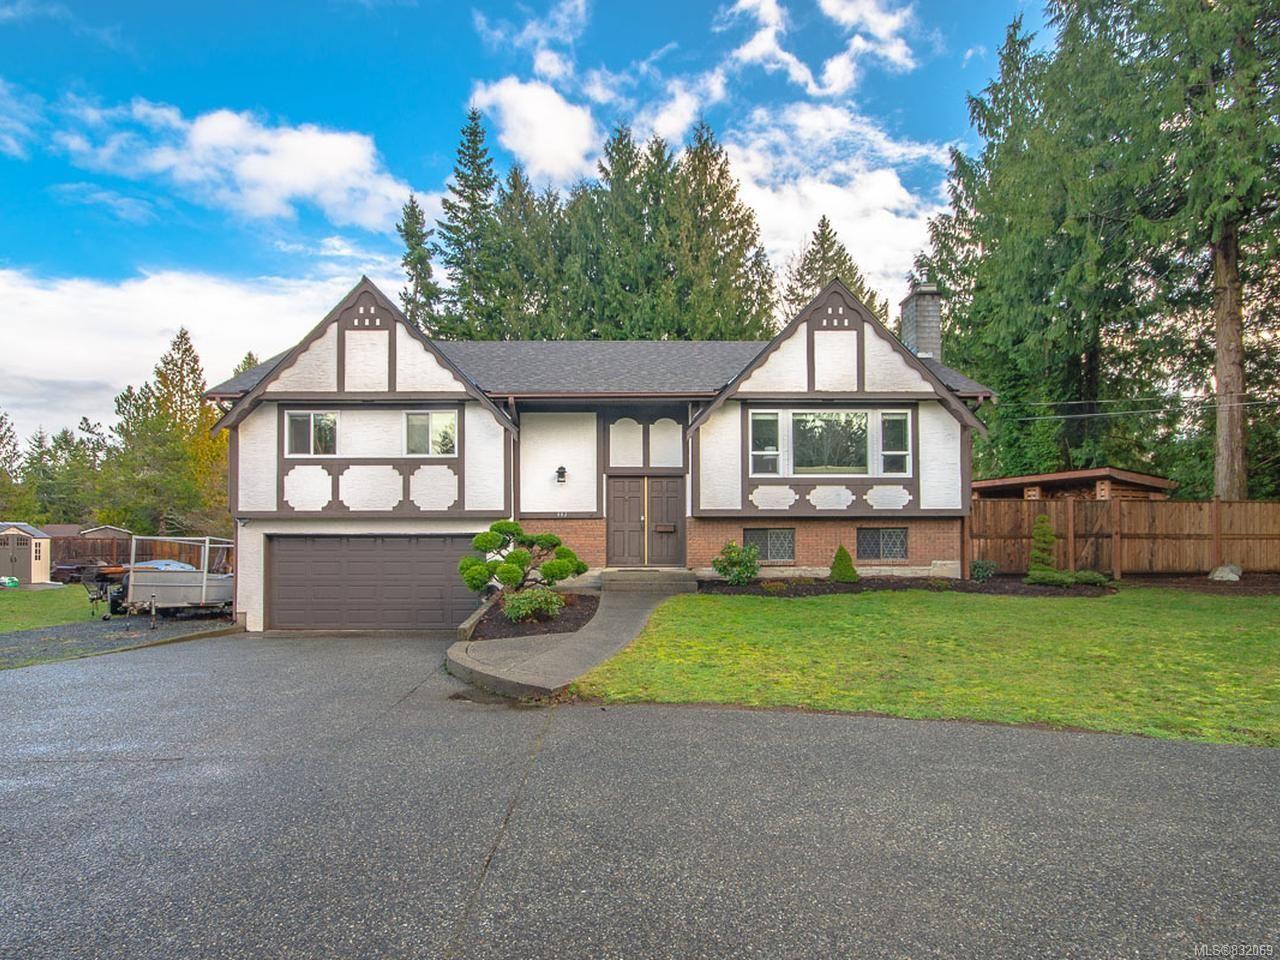 Main Photo: 802 Terrien Way in PARKSVILLE: PQ Parksville House for sale (Parksville/Qualicum)  : MLS®# 832069